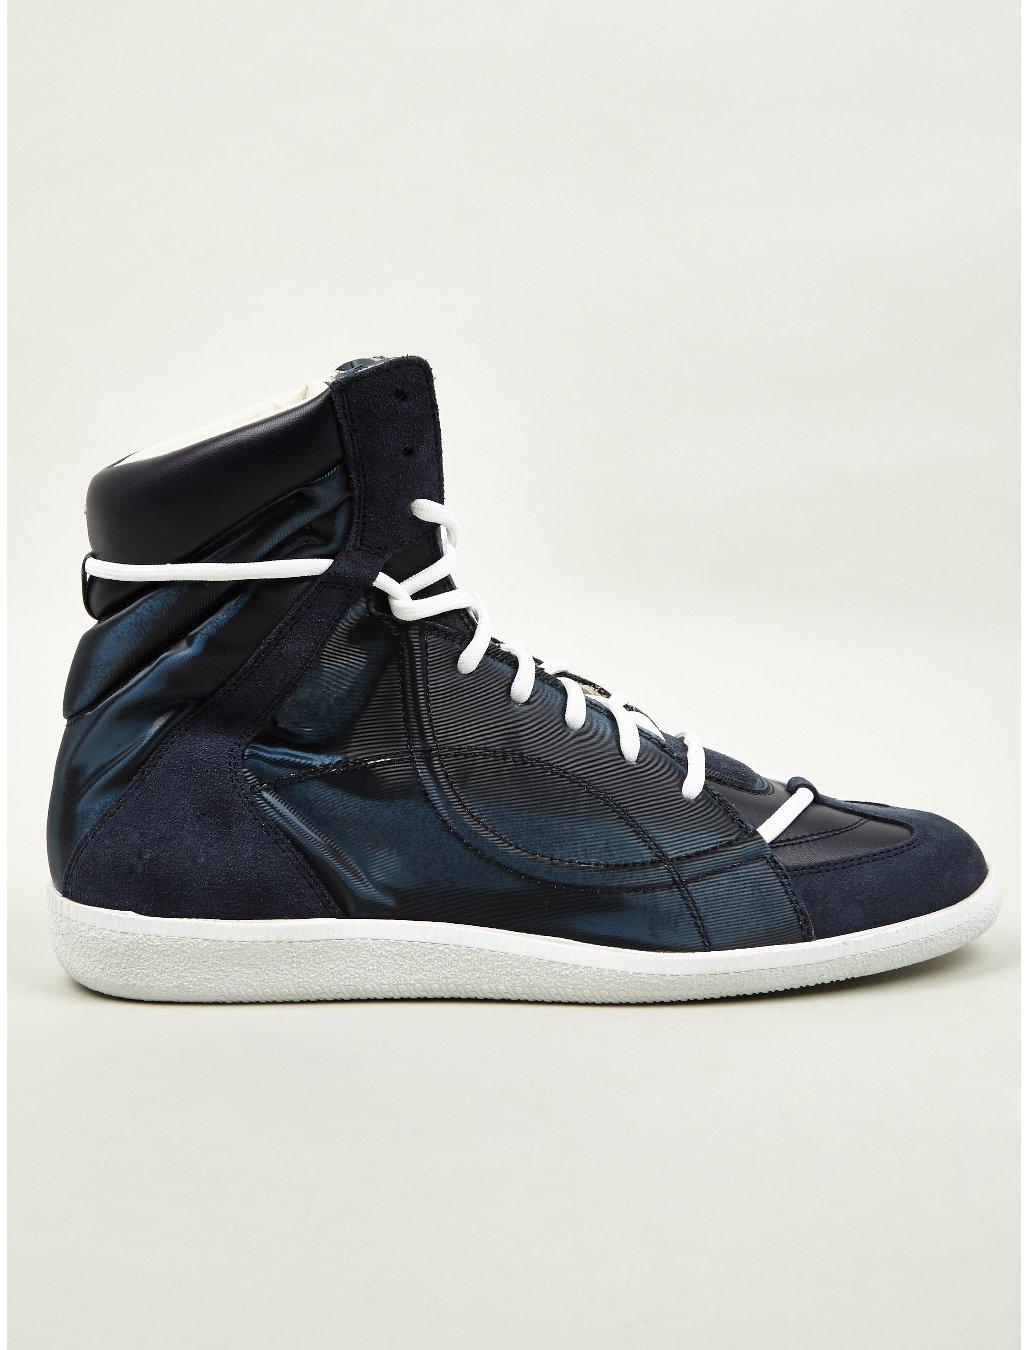 maison martin margiela 22 mens hidden lace midtop sneakers in blue for men lyst. Black Bedroom Furniture Sets. Home Design Ideas